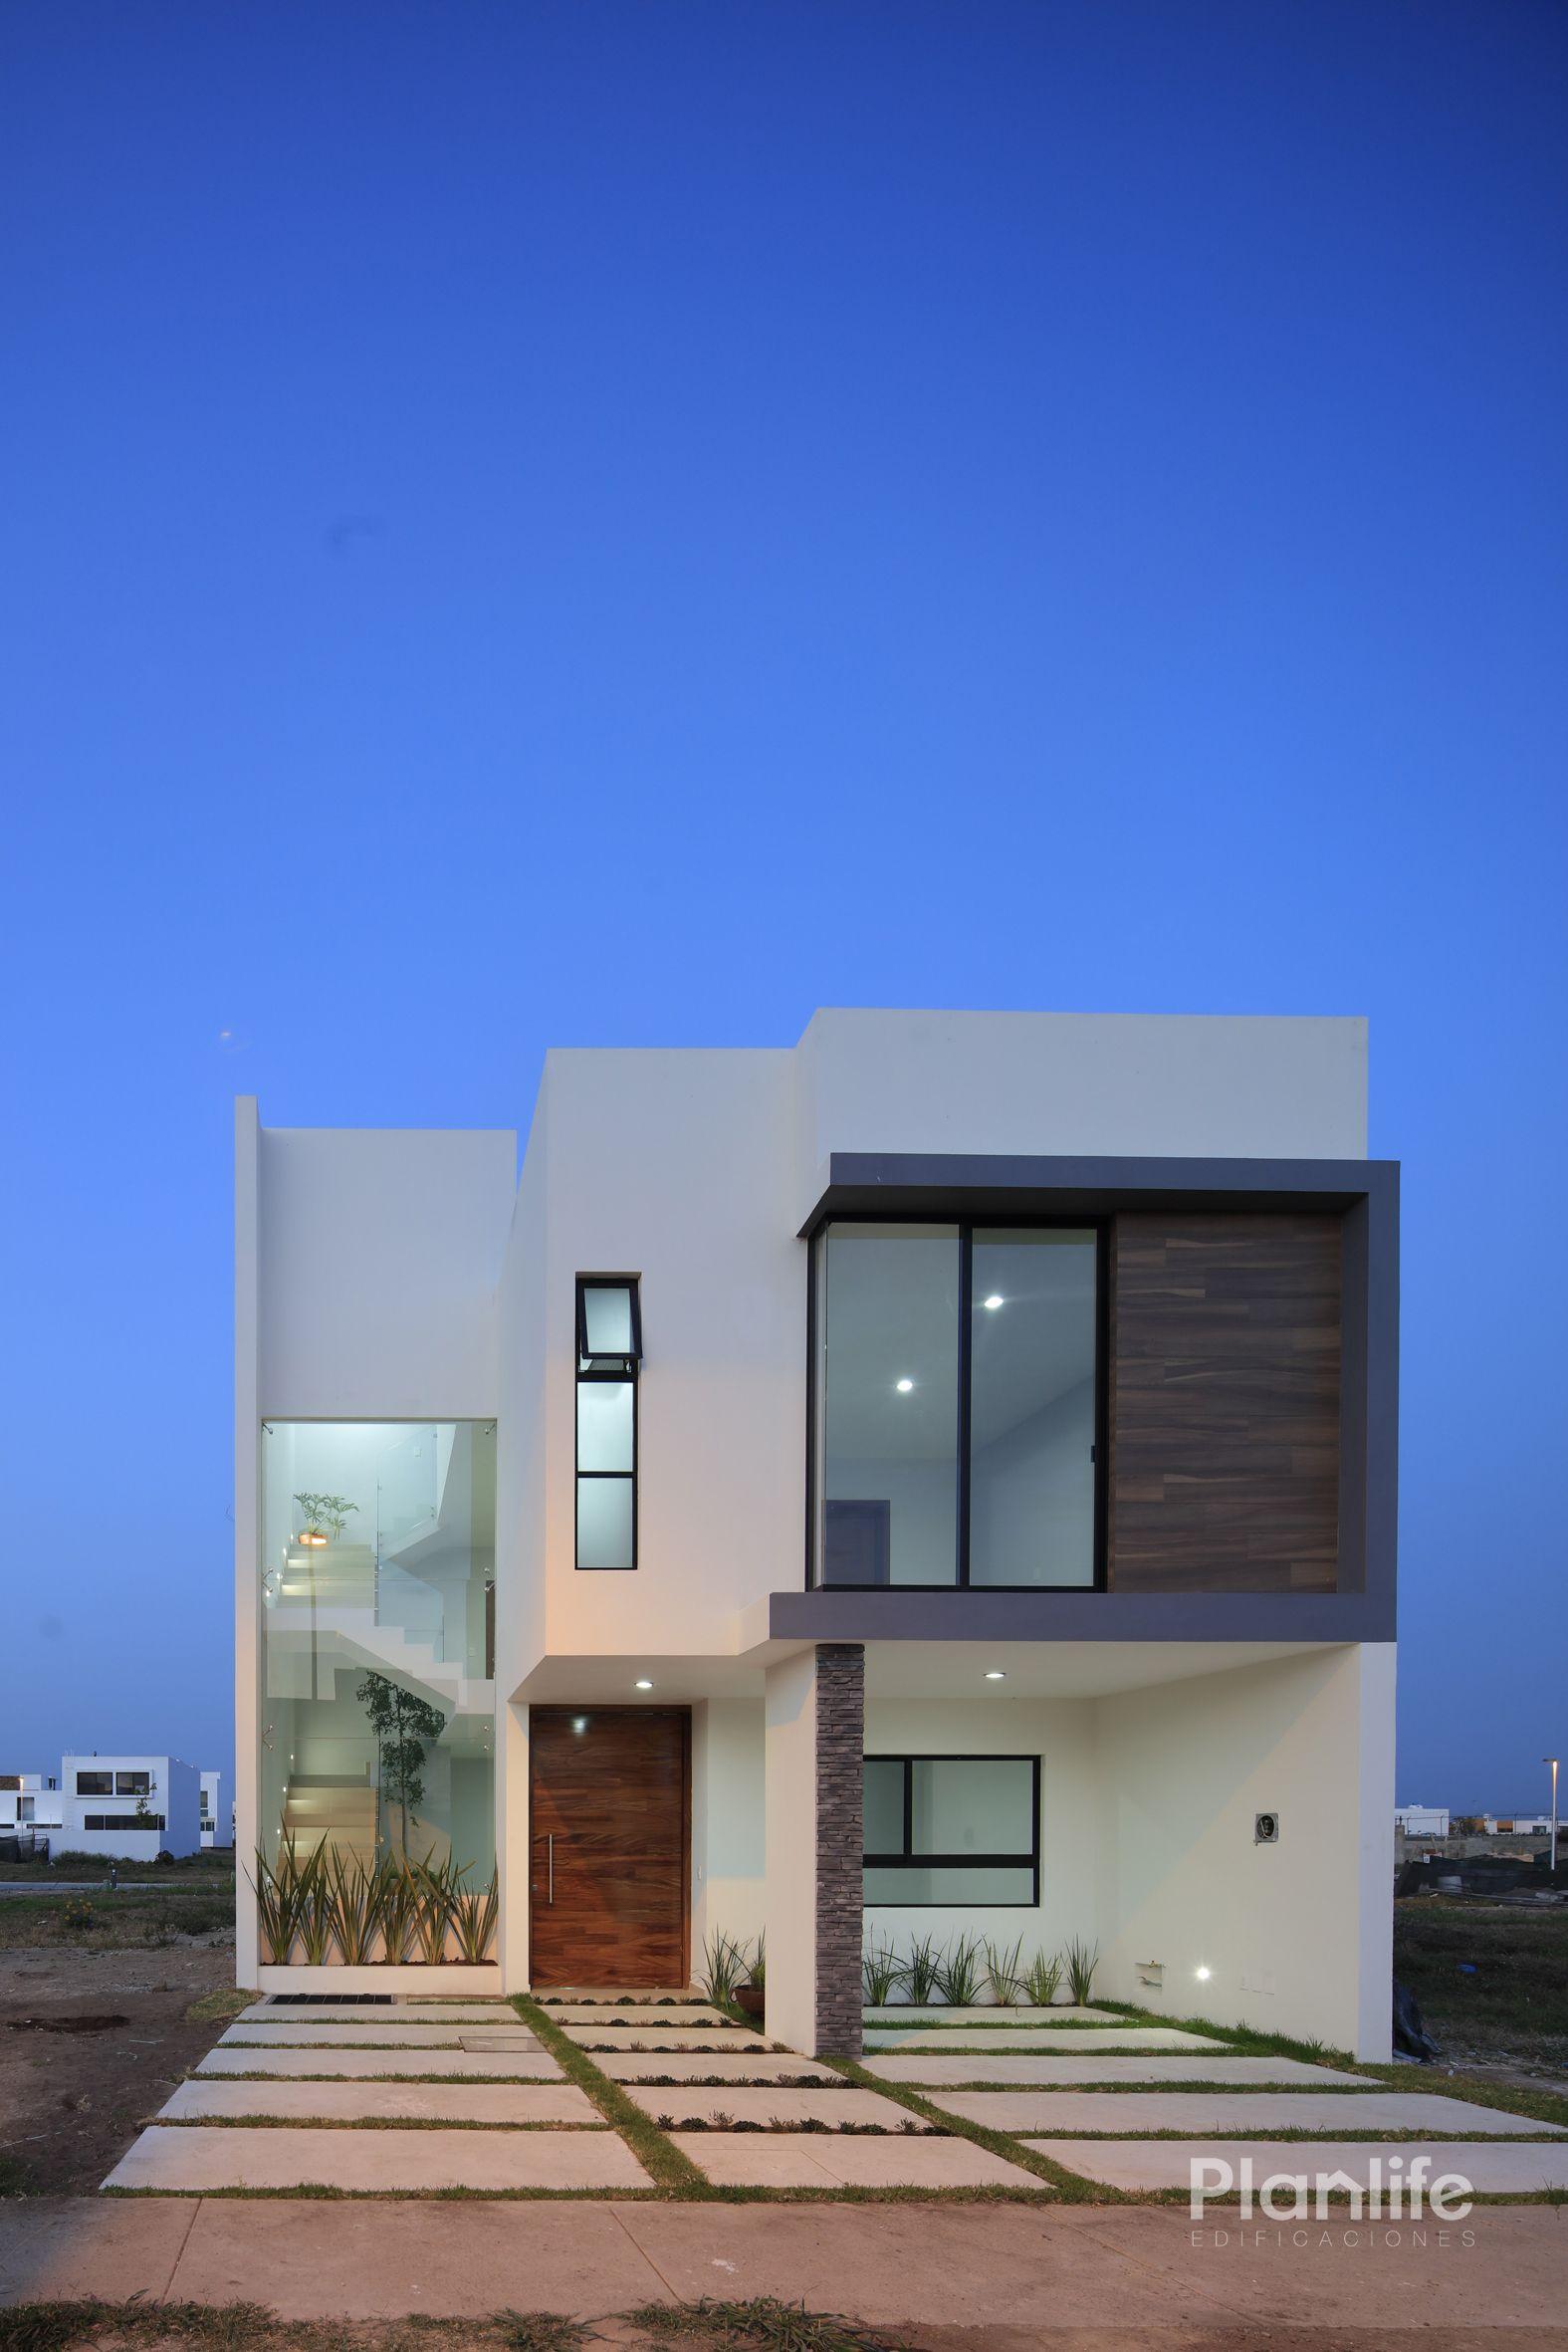 31 Modern Home Decor Ideas For 2016: CASA PAROTA / Fracc. Punto Sur